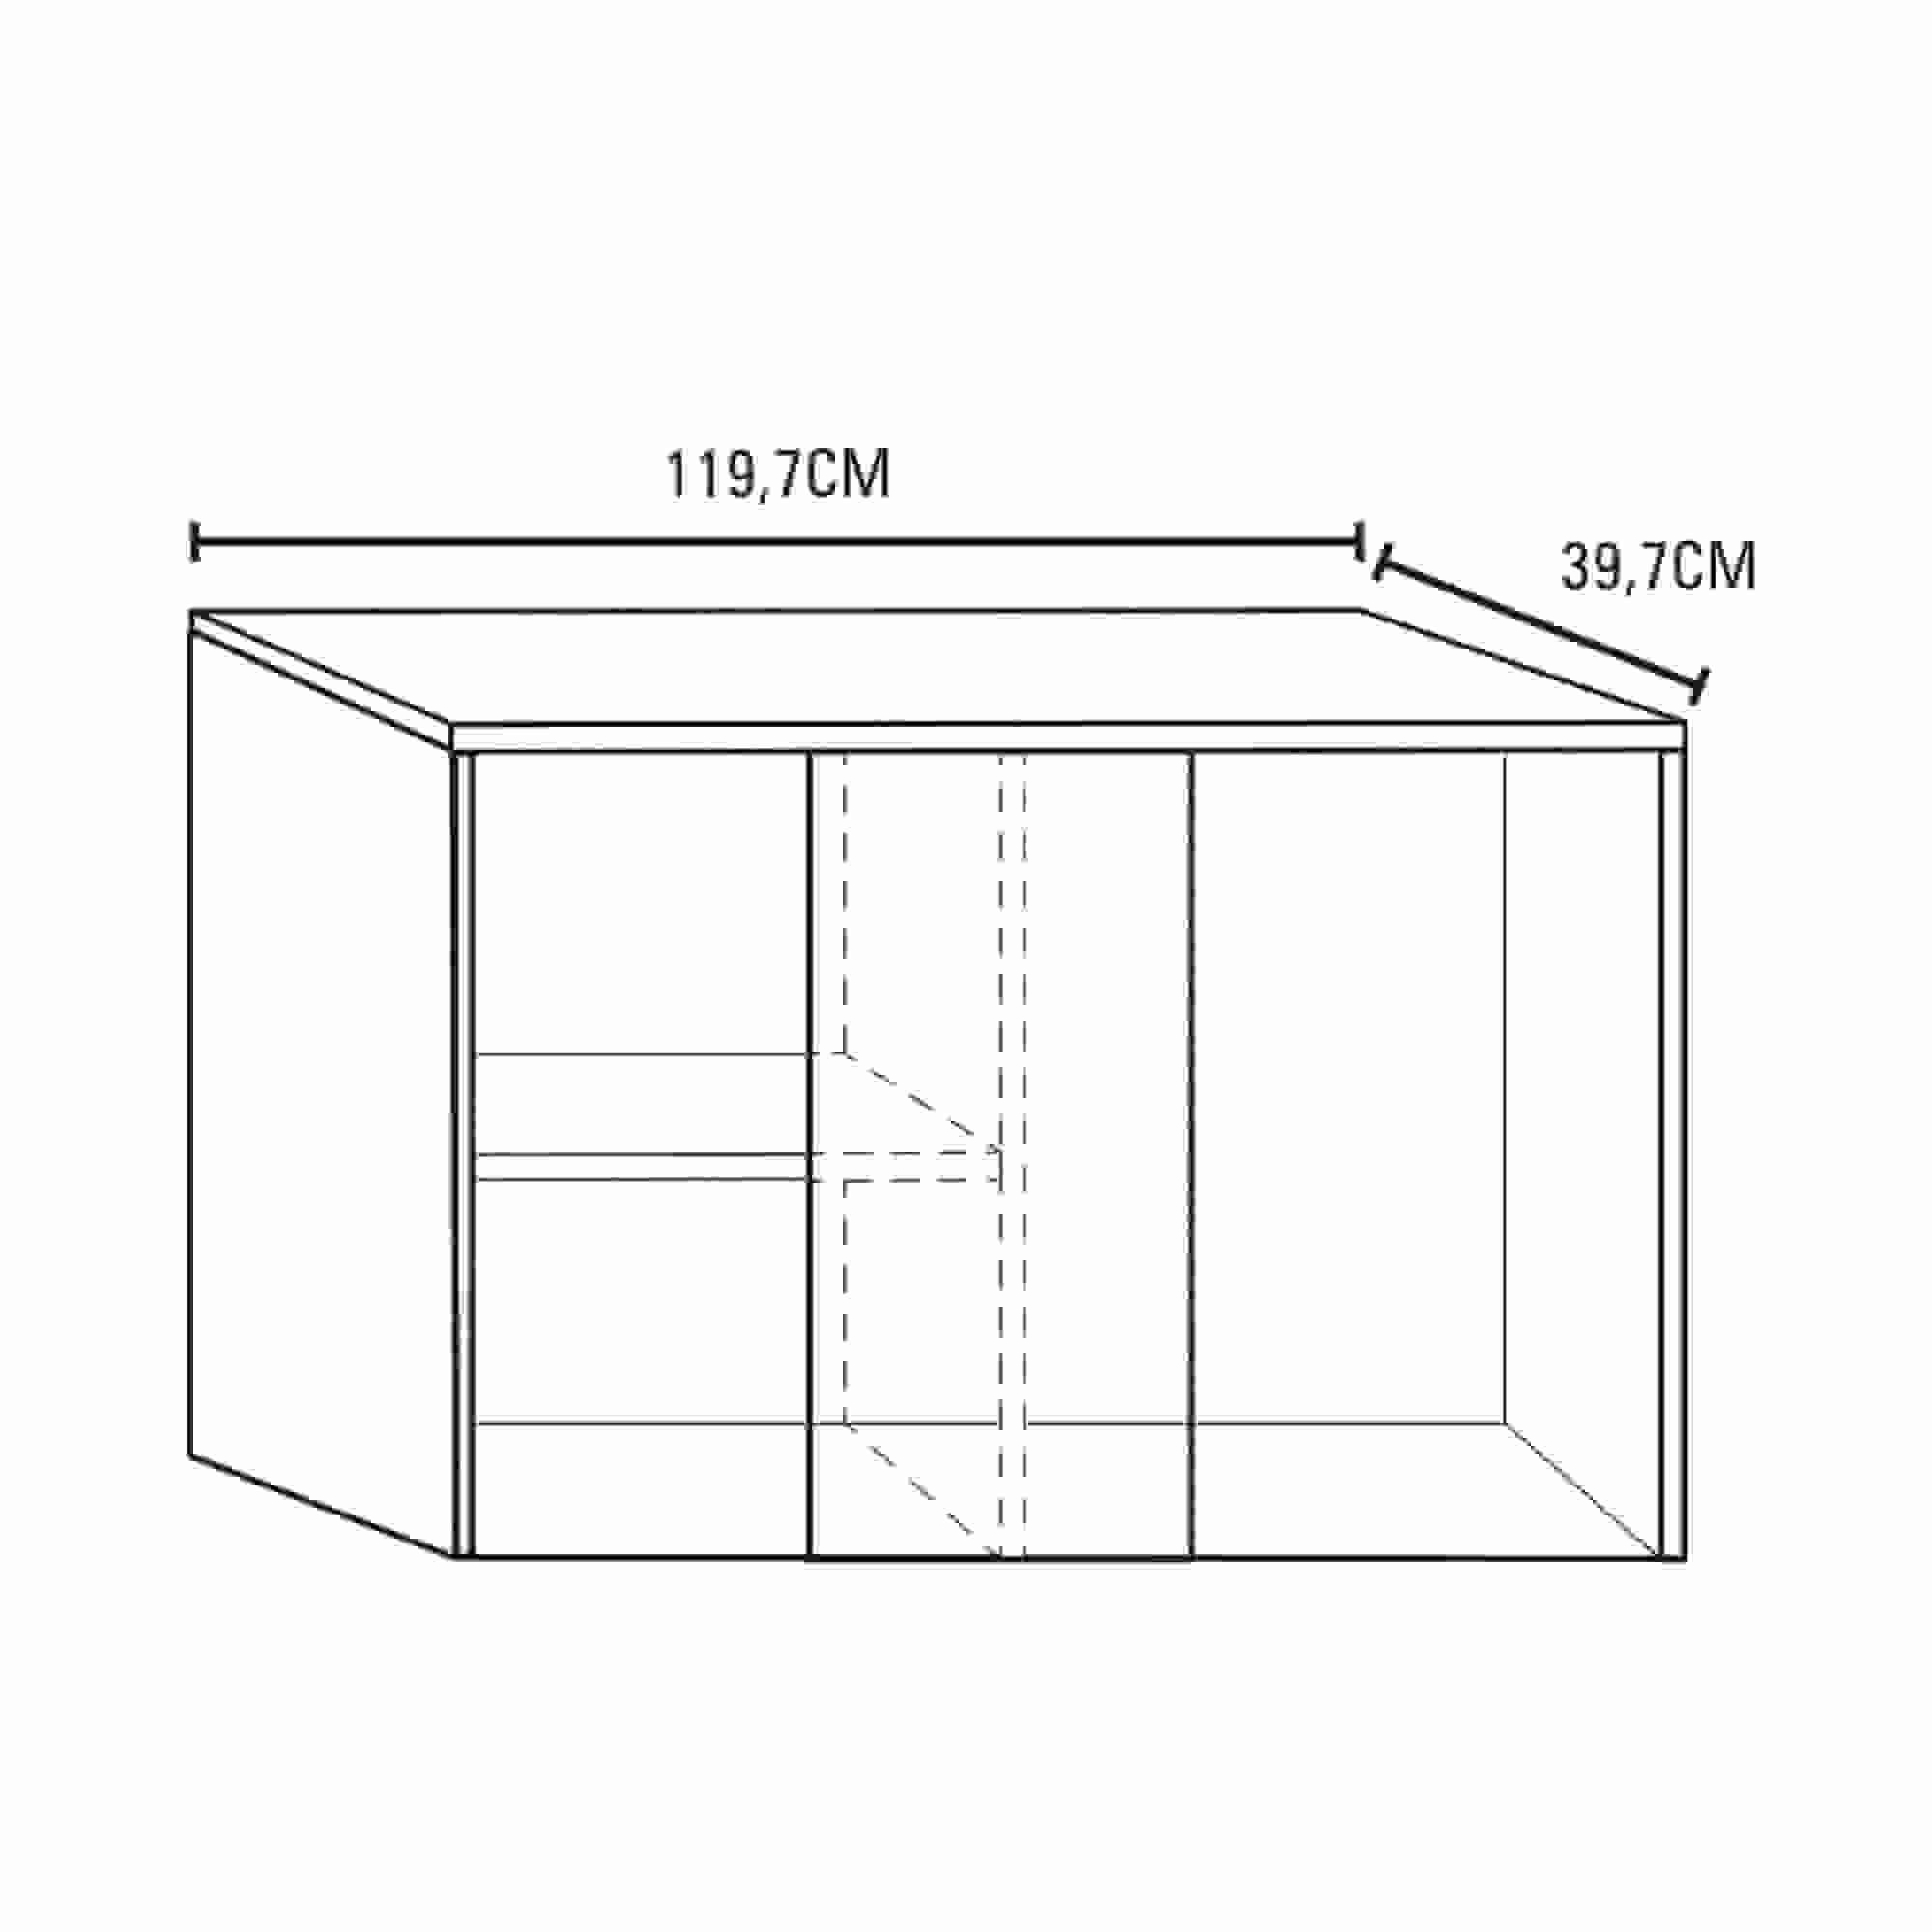 mesa-m24030-mueble-acuario-acuarios-aqualux-240-aqualight-aqualed-armario-med.jpg